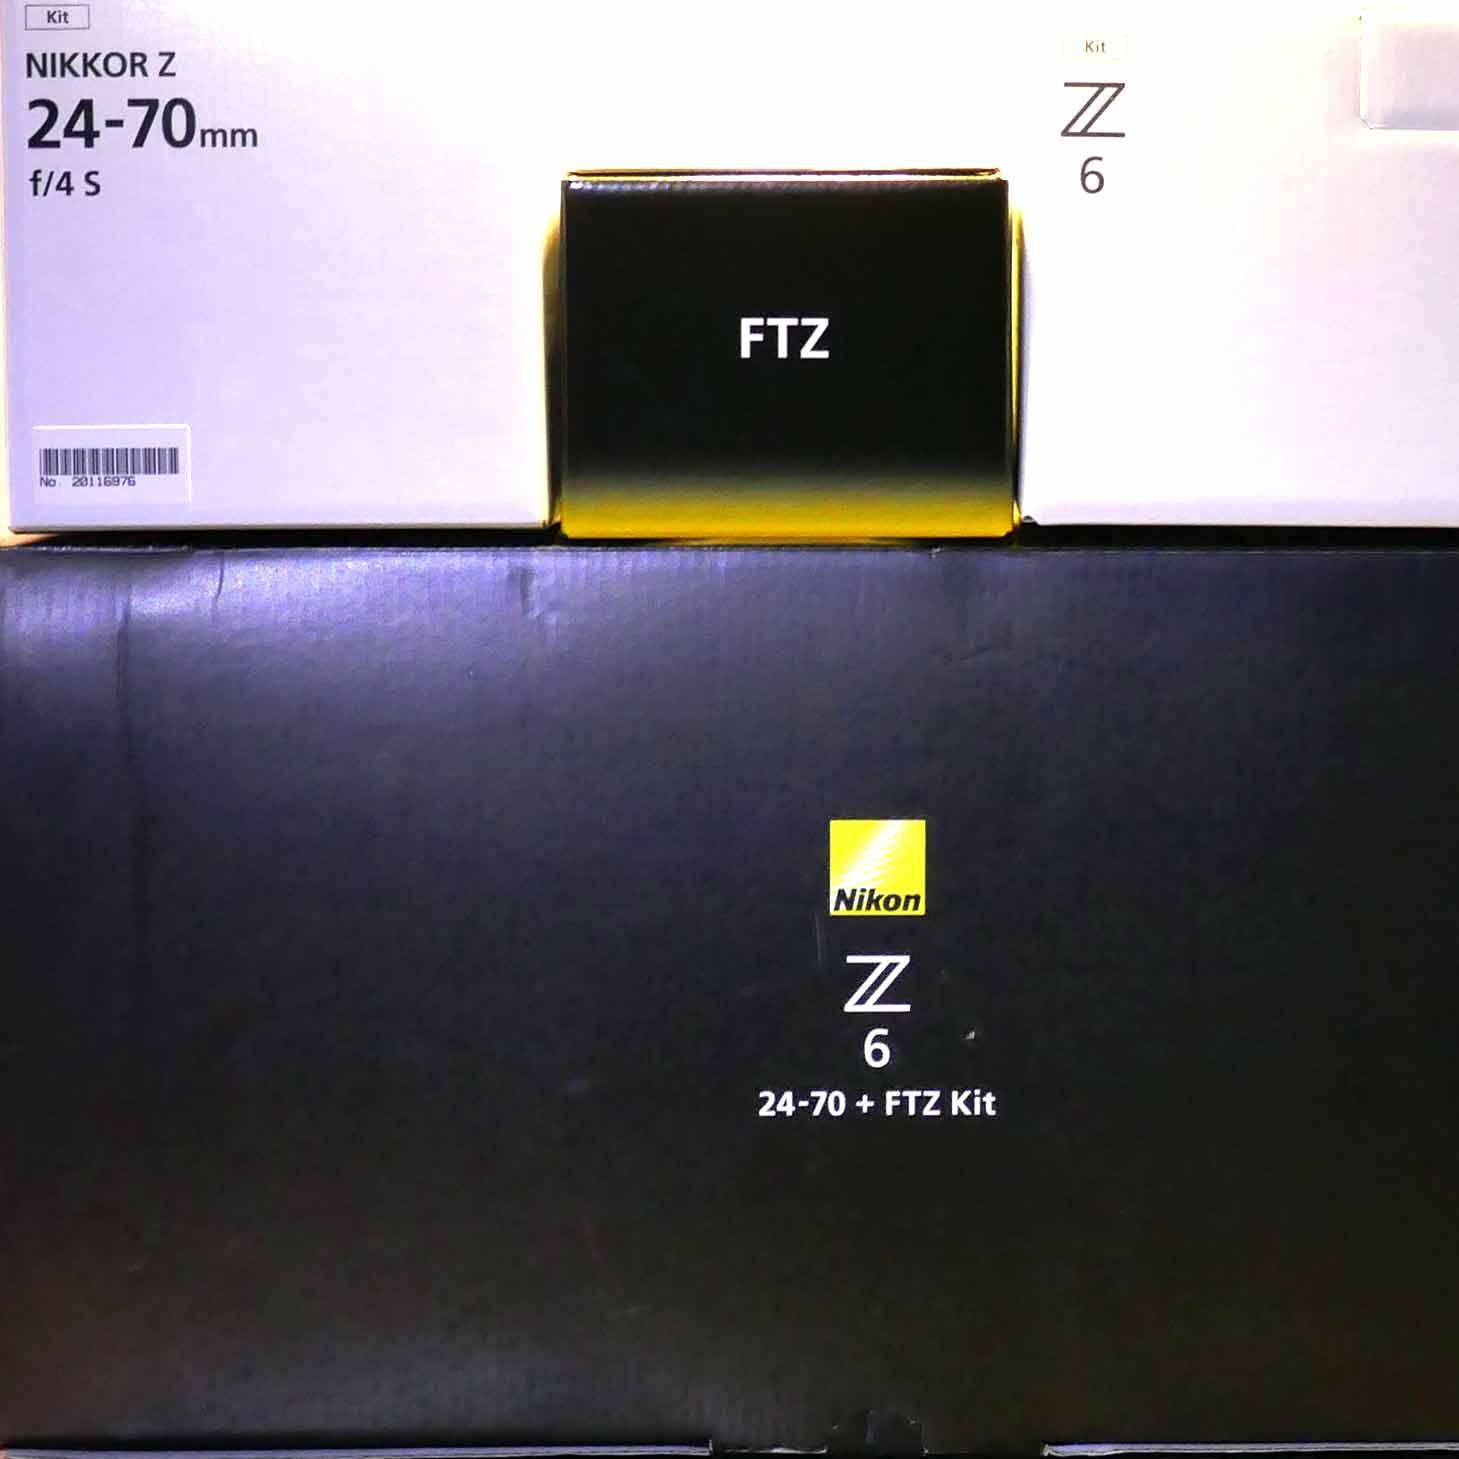 clean-cameras-Nikon-Z6-Kit-24-70-FTZ-14